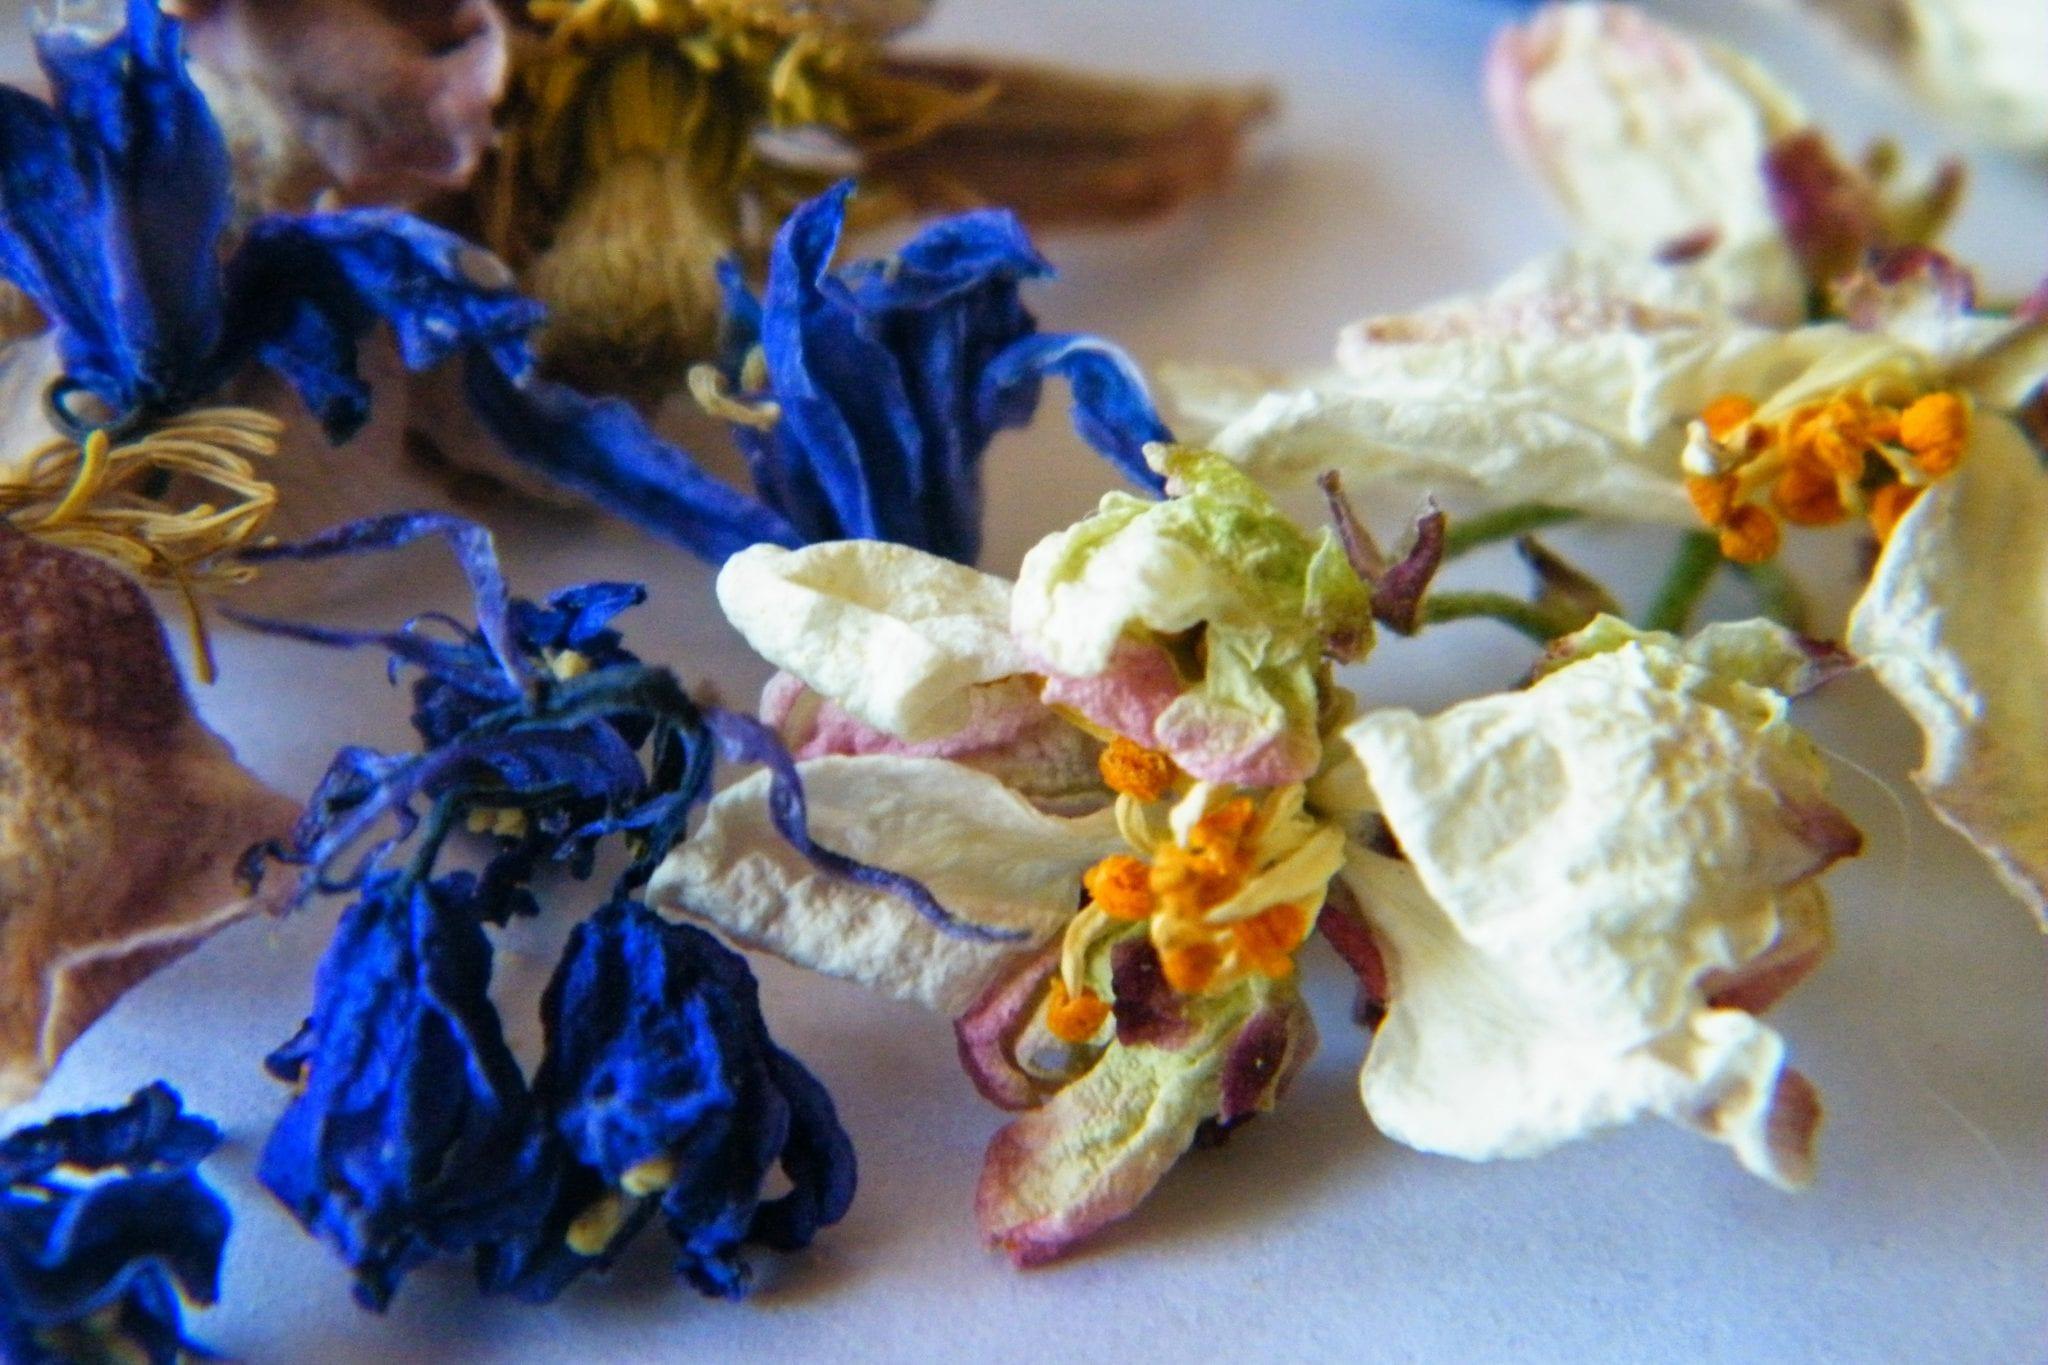 dried clematis, bluebells, orange flowers